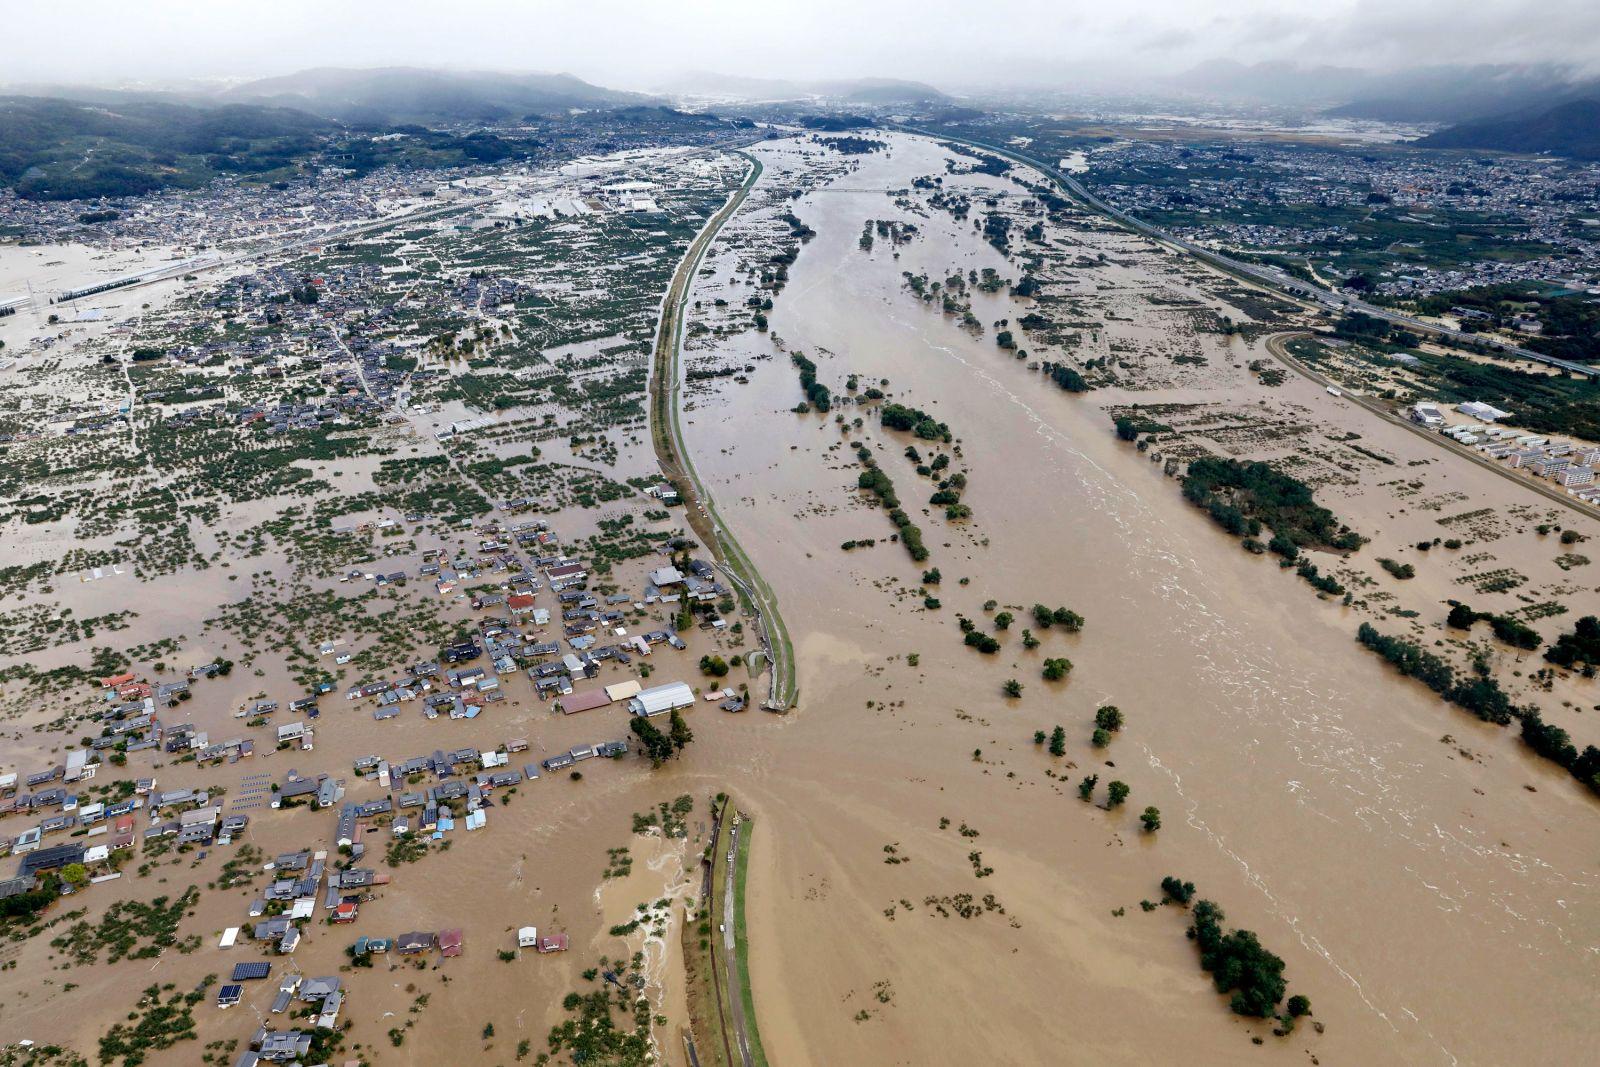 In photos: Typhoon Hagibis hits Japan